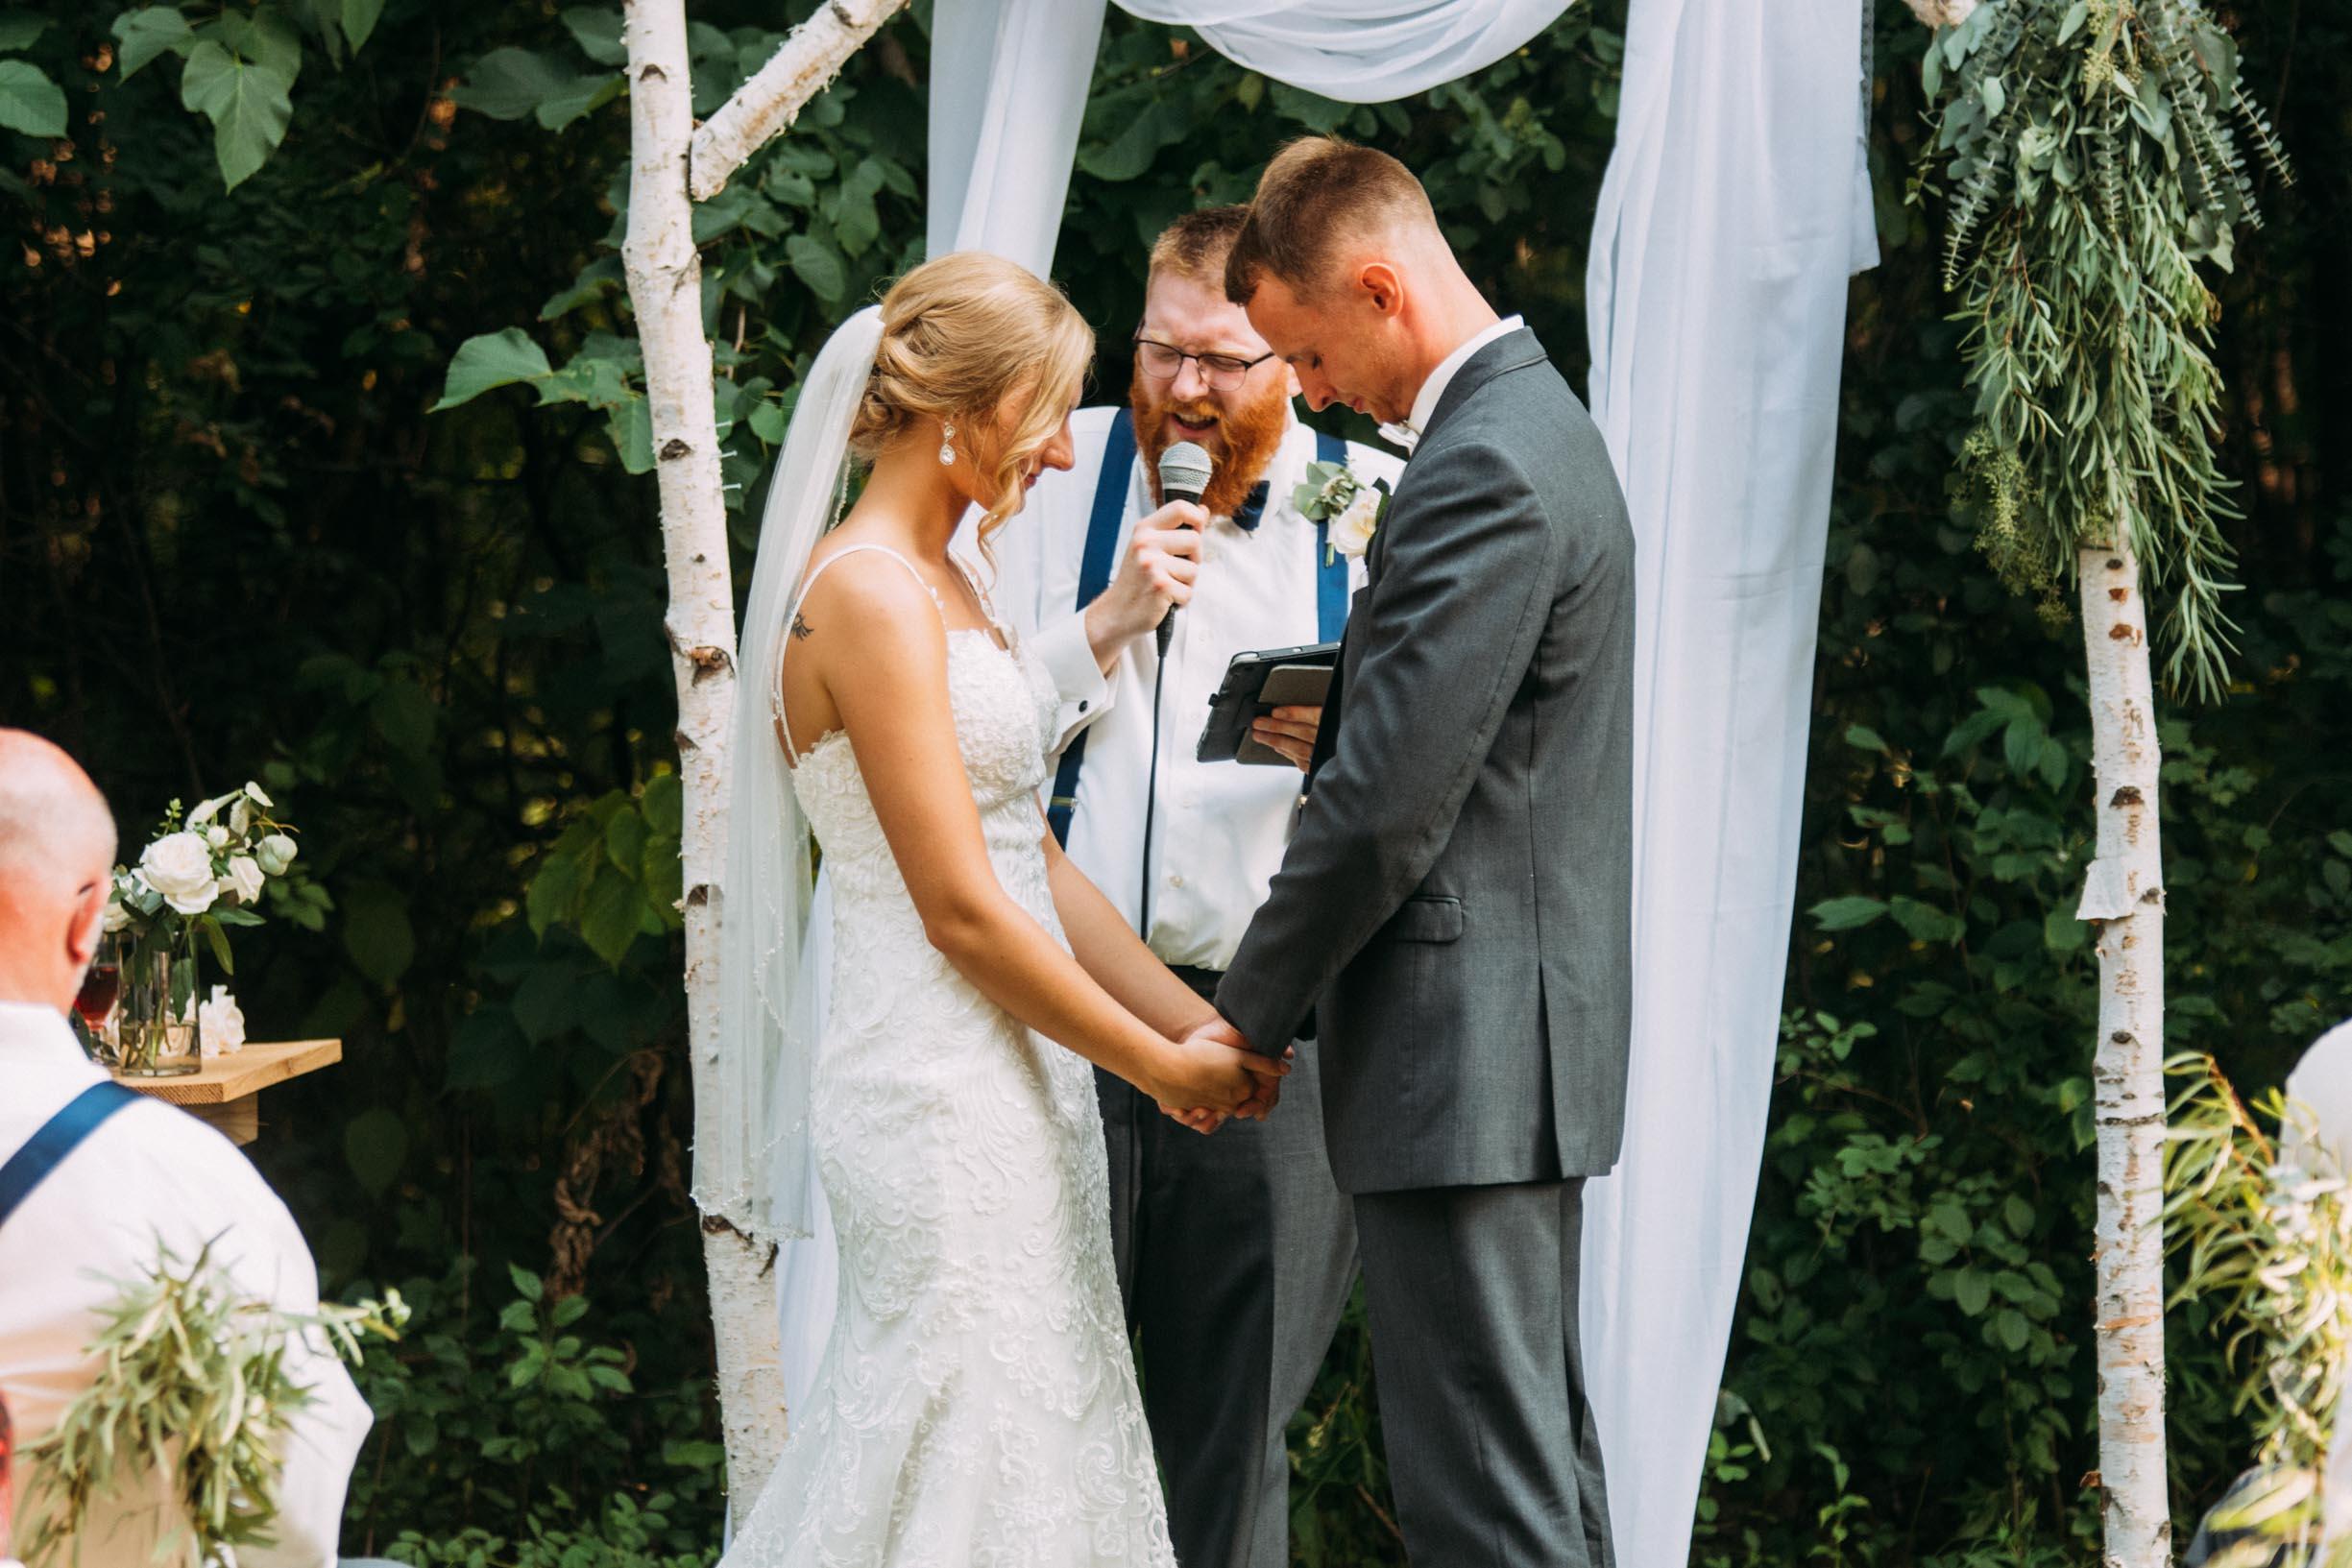 21-Minnetonka Orchards Wedding Ashley Bryce Blog.jpg